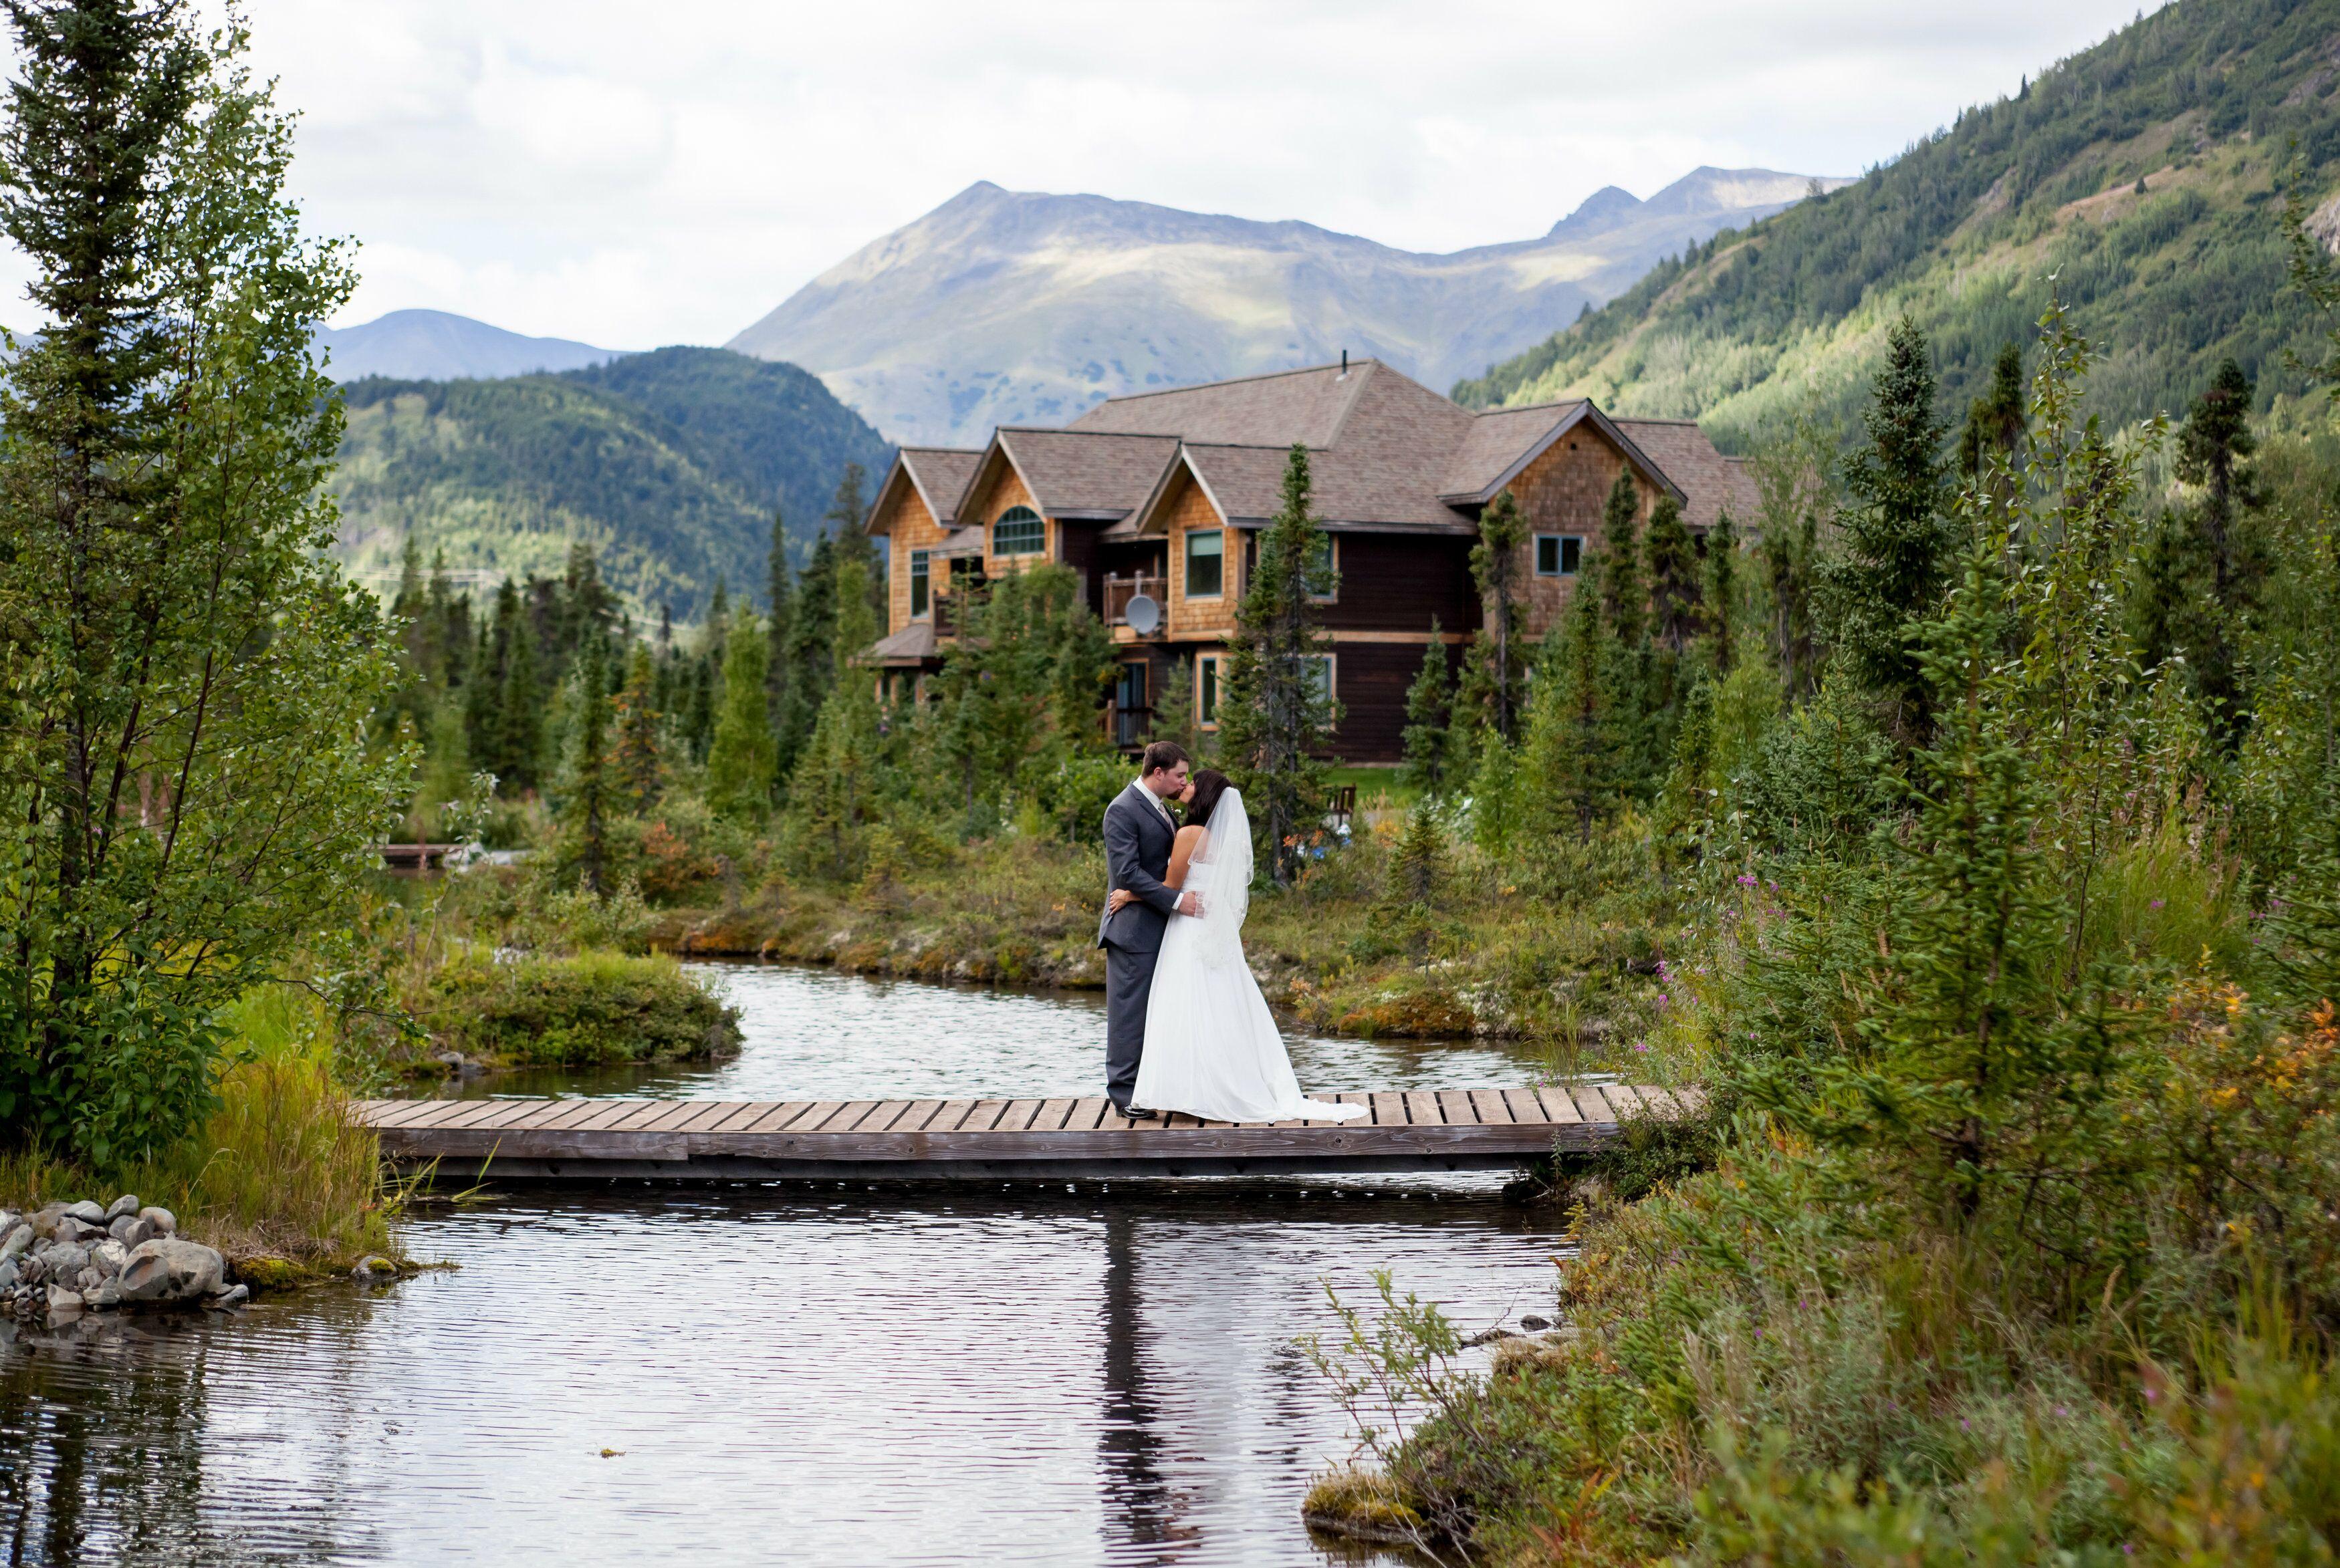 A Rustic Mountain Wedding At Inn At Tern Lake In Moose